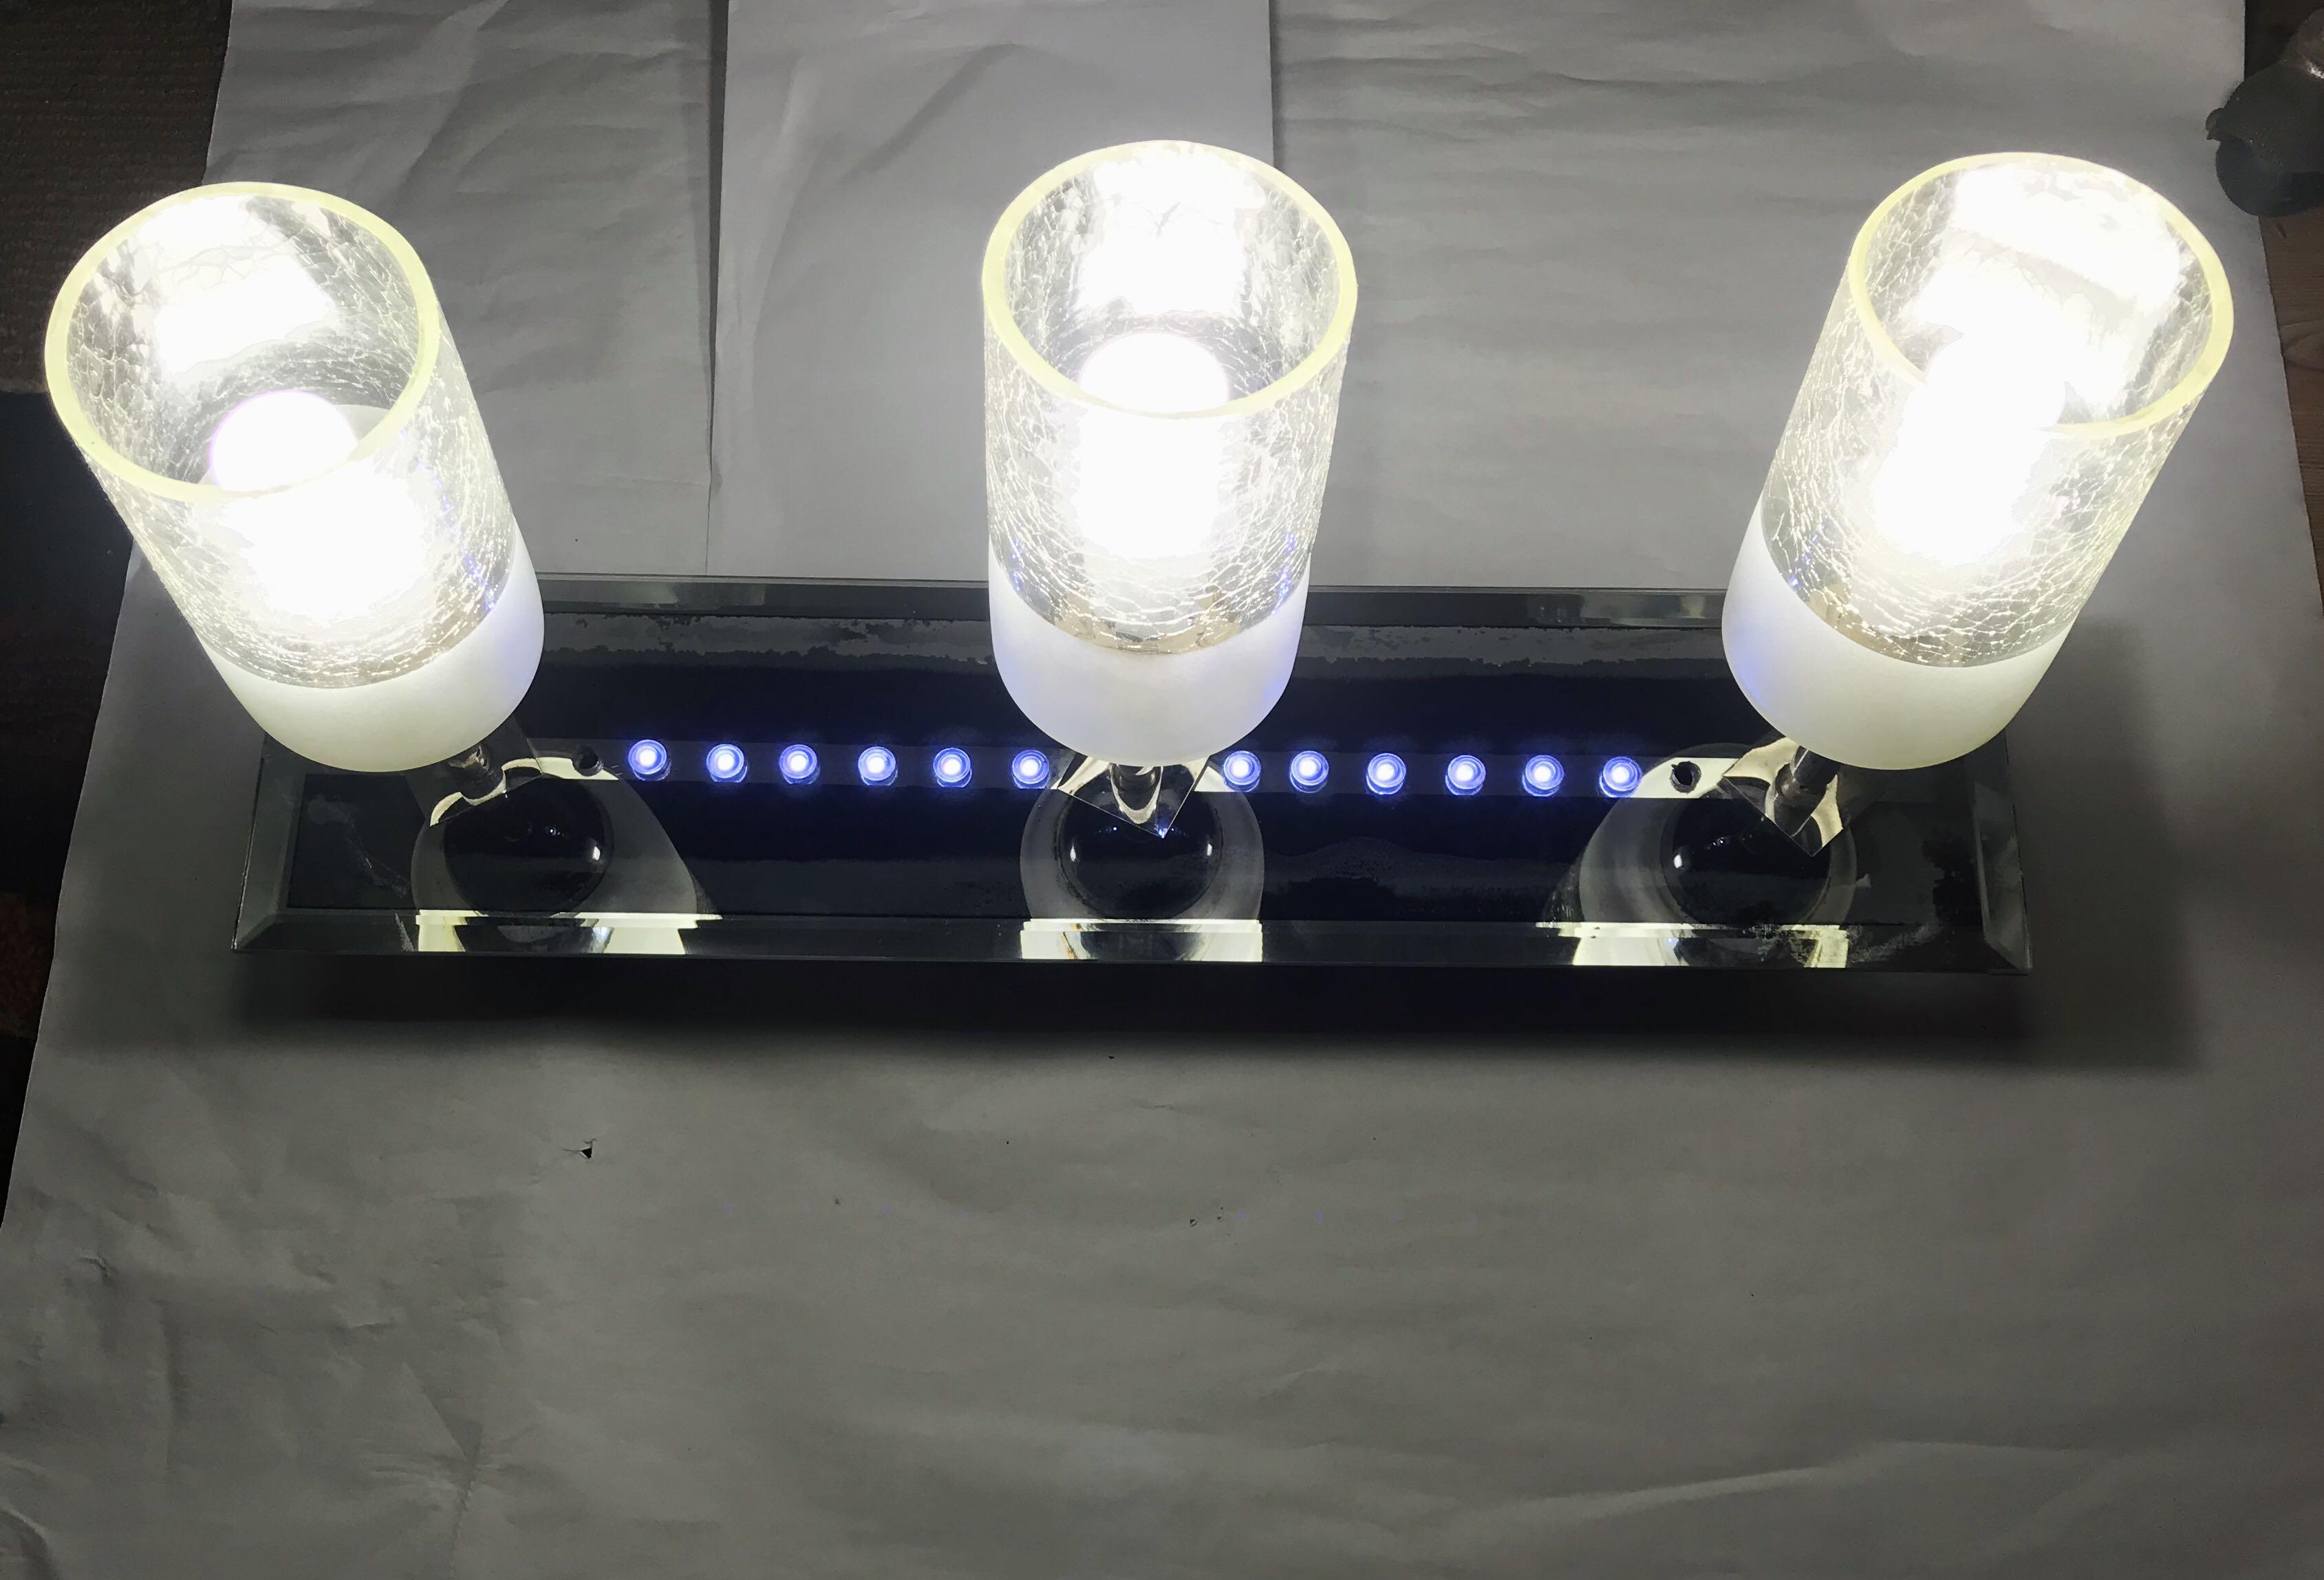 3 Set Lampu Cantik Untuk Rumah Candelia Light Home Furniture Home Decor On Carousell